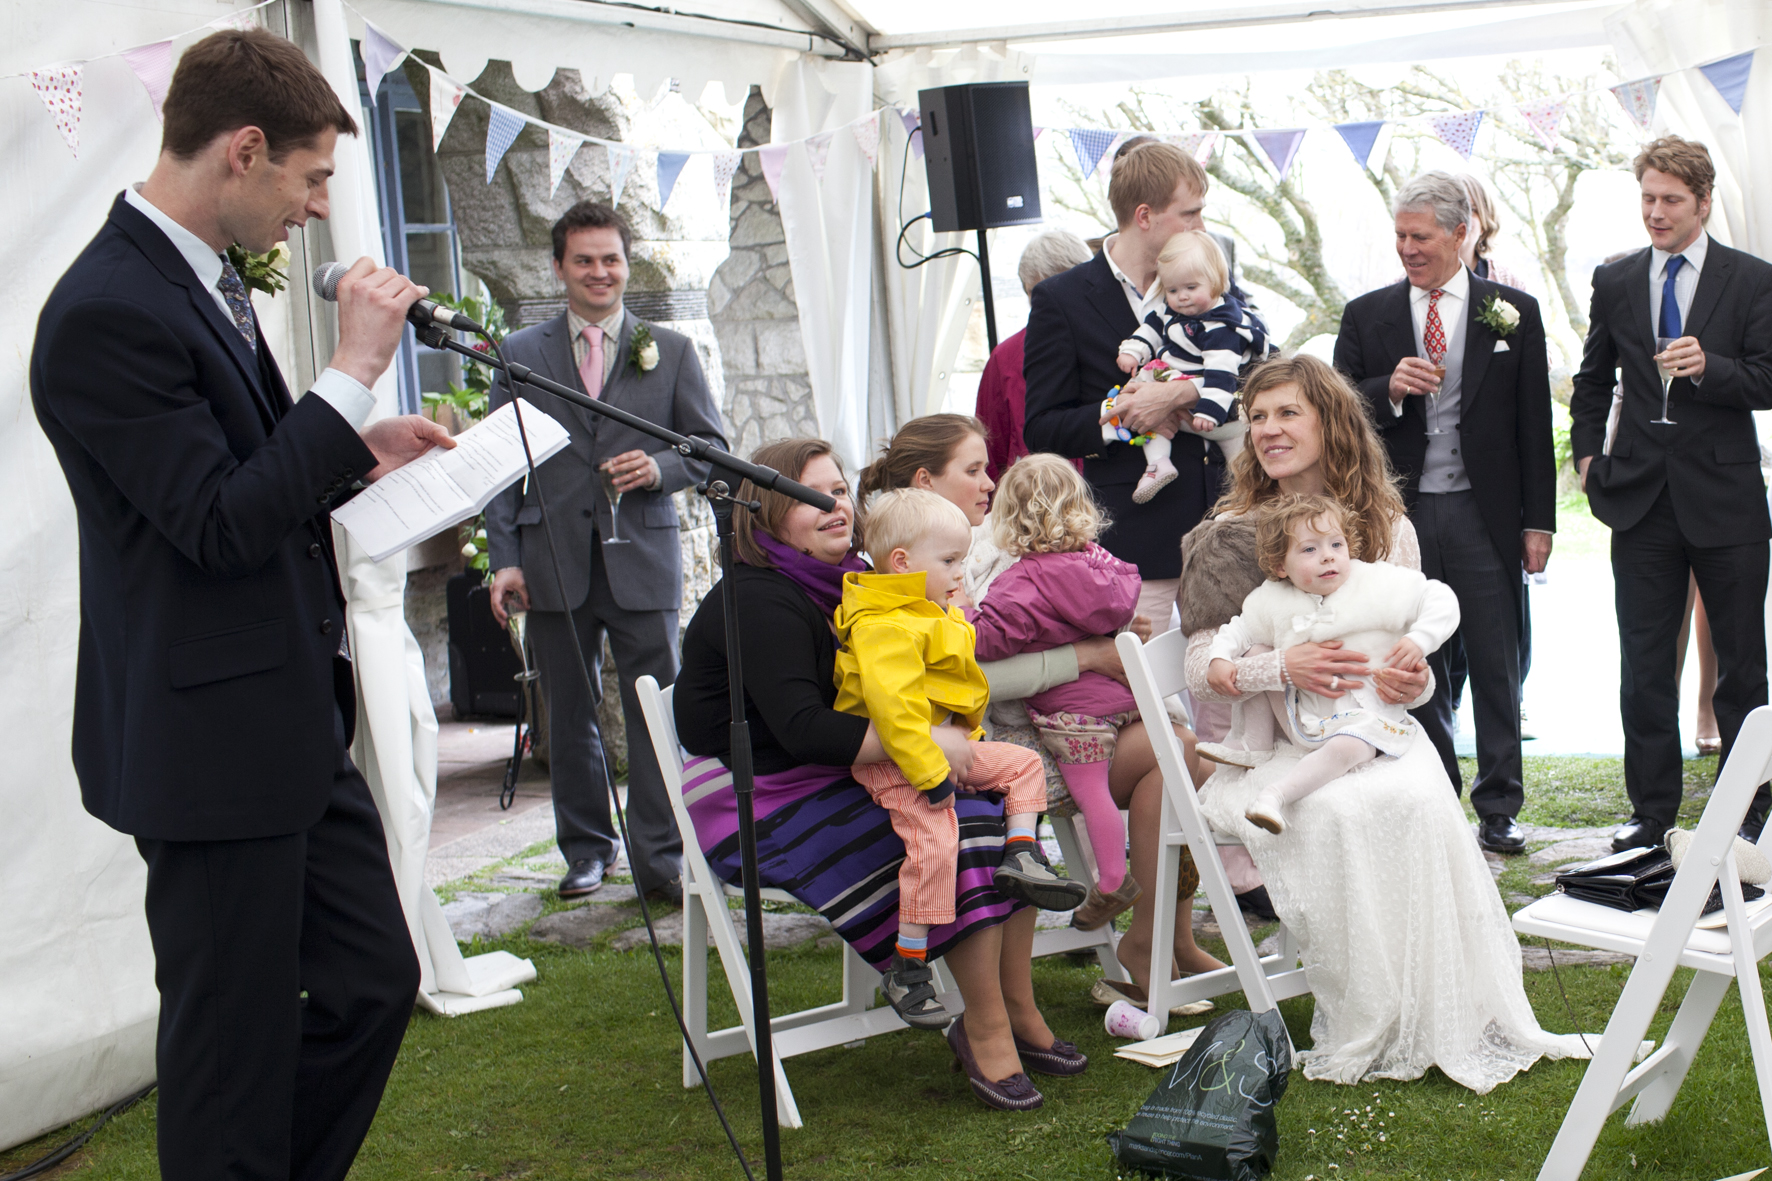 Wedding example_M&P__MG_3843_Claudia Leisinger.jpg